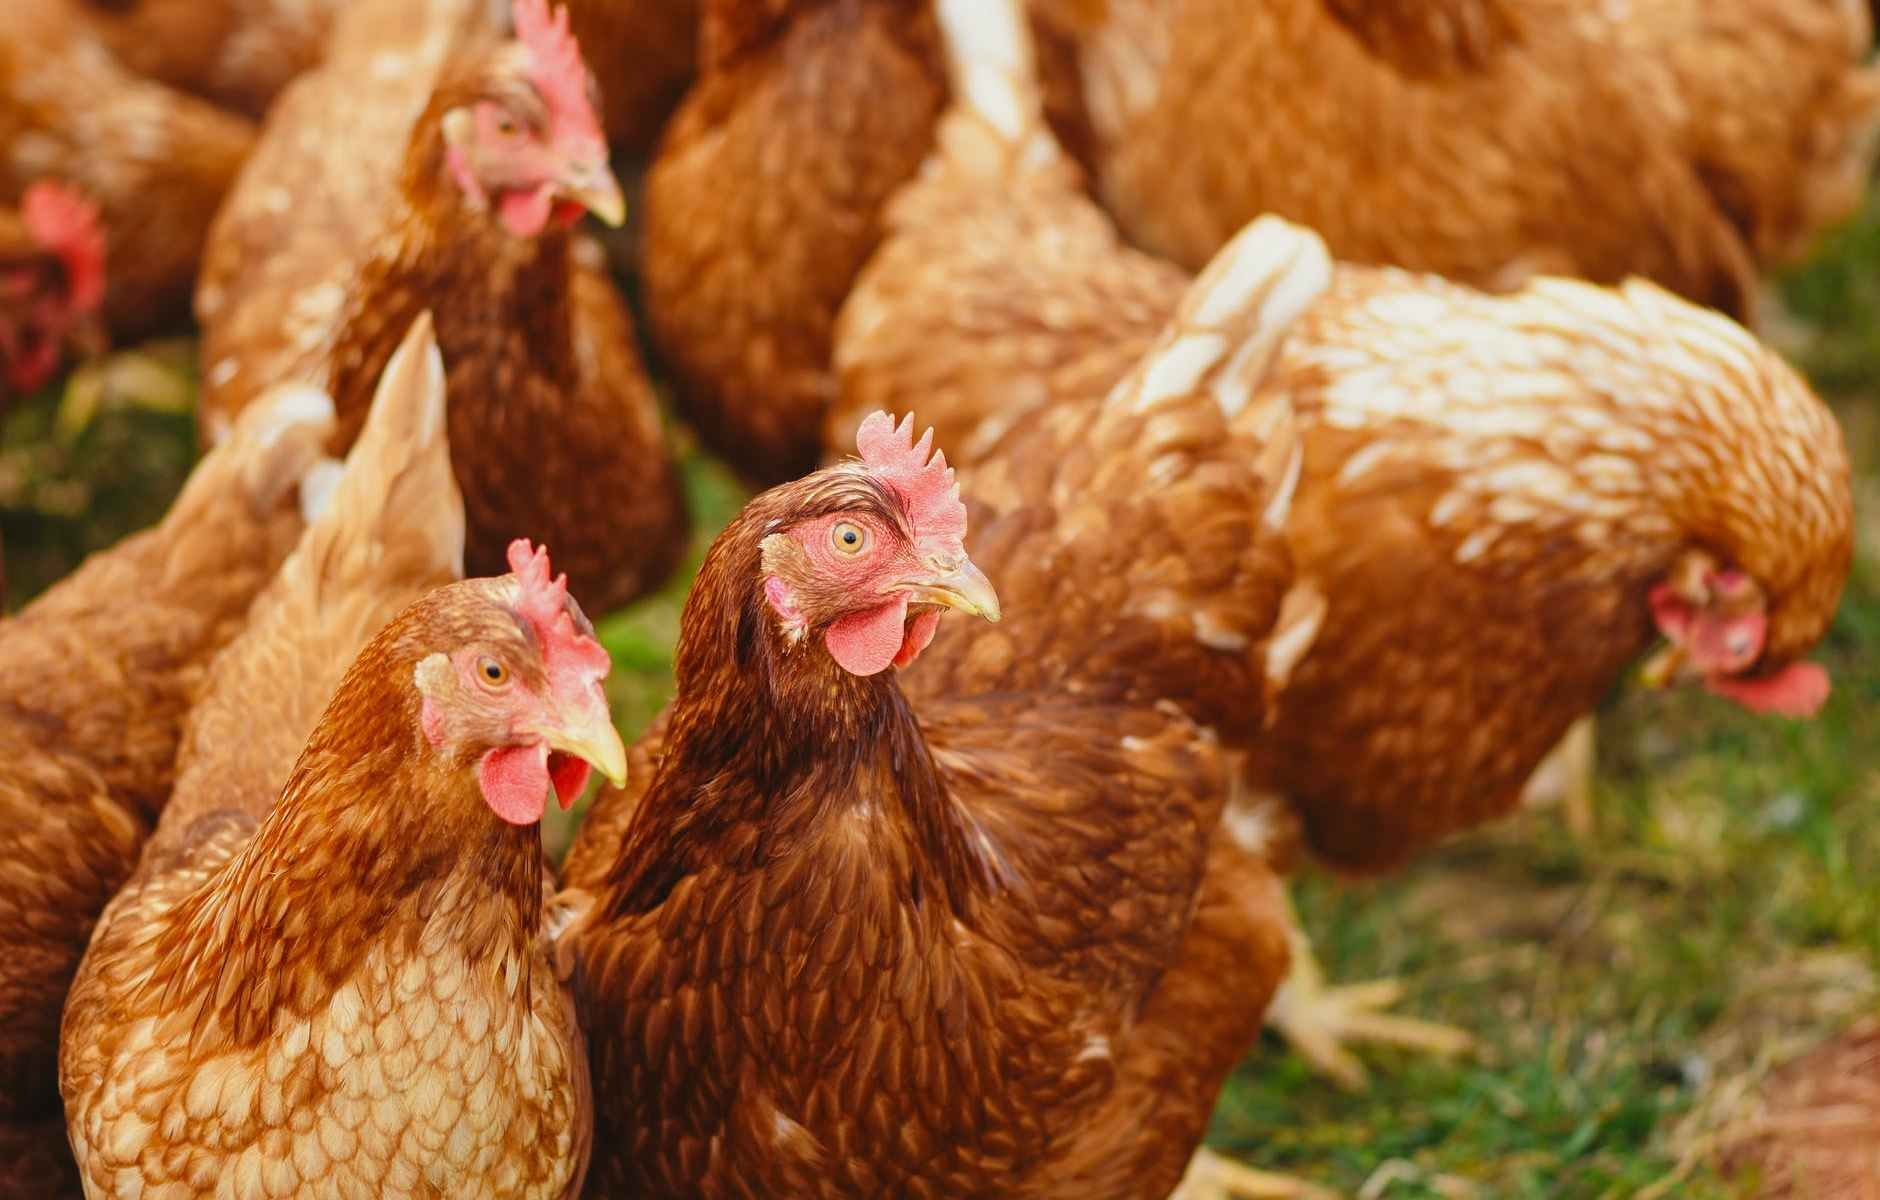 flock of hens on green field